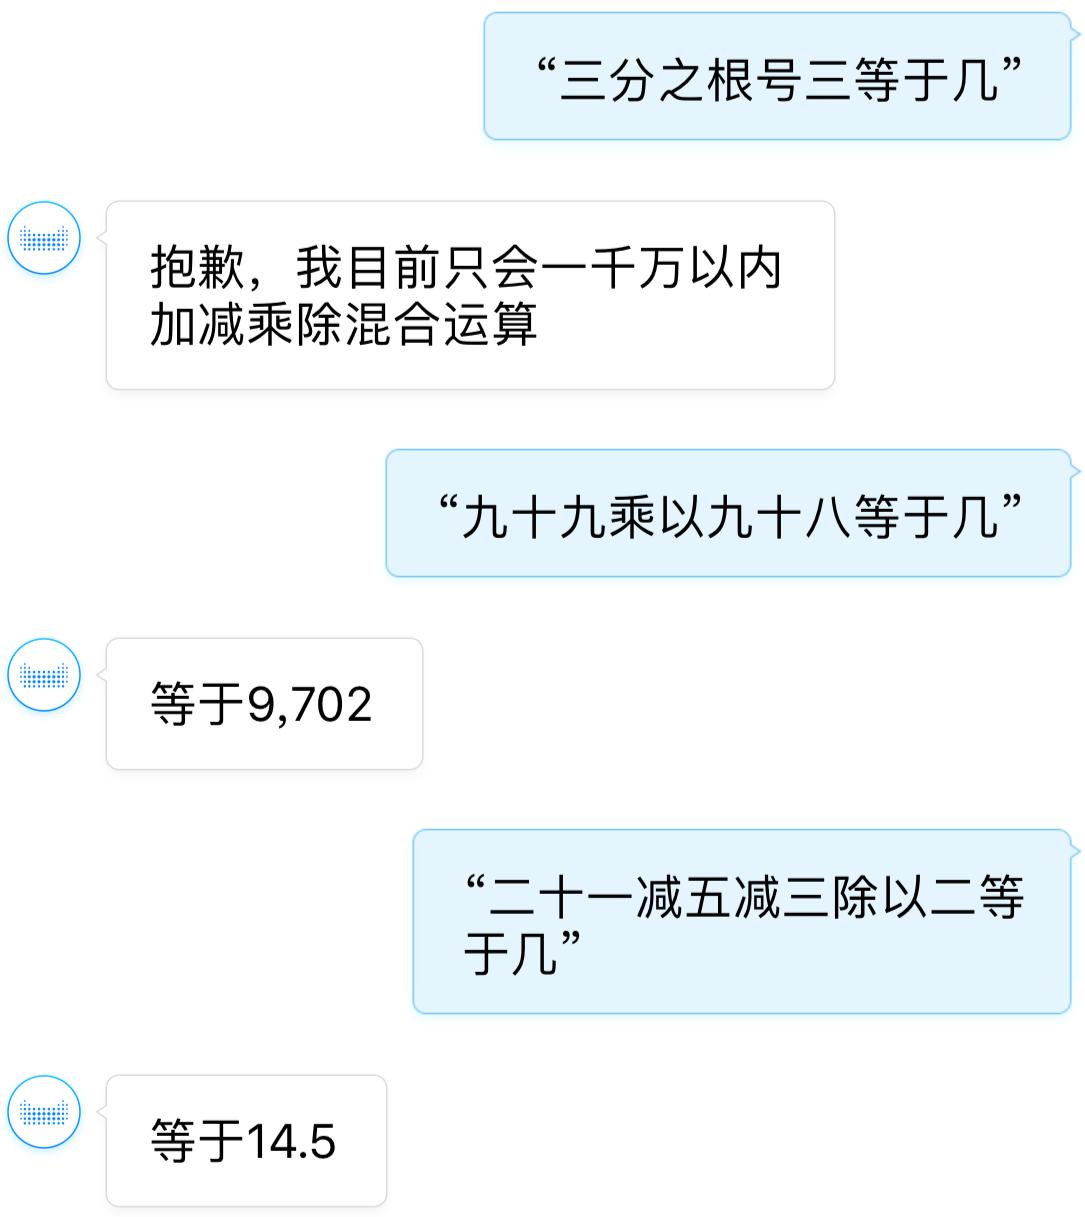 对话截图2.PNG